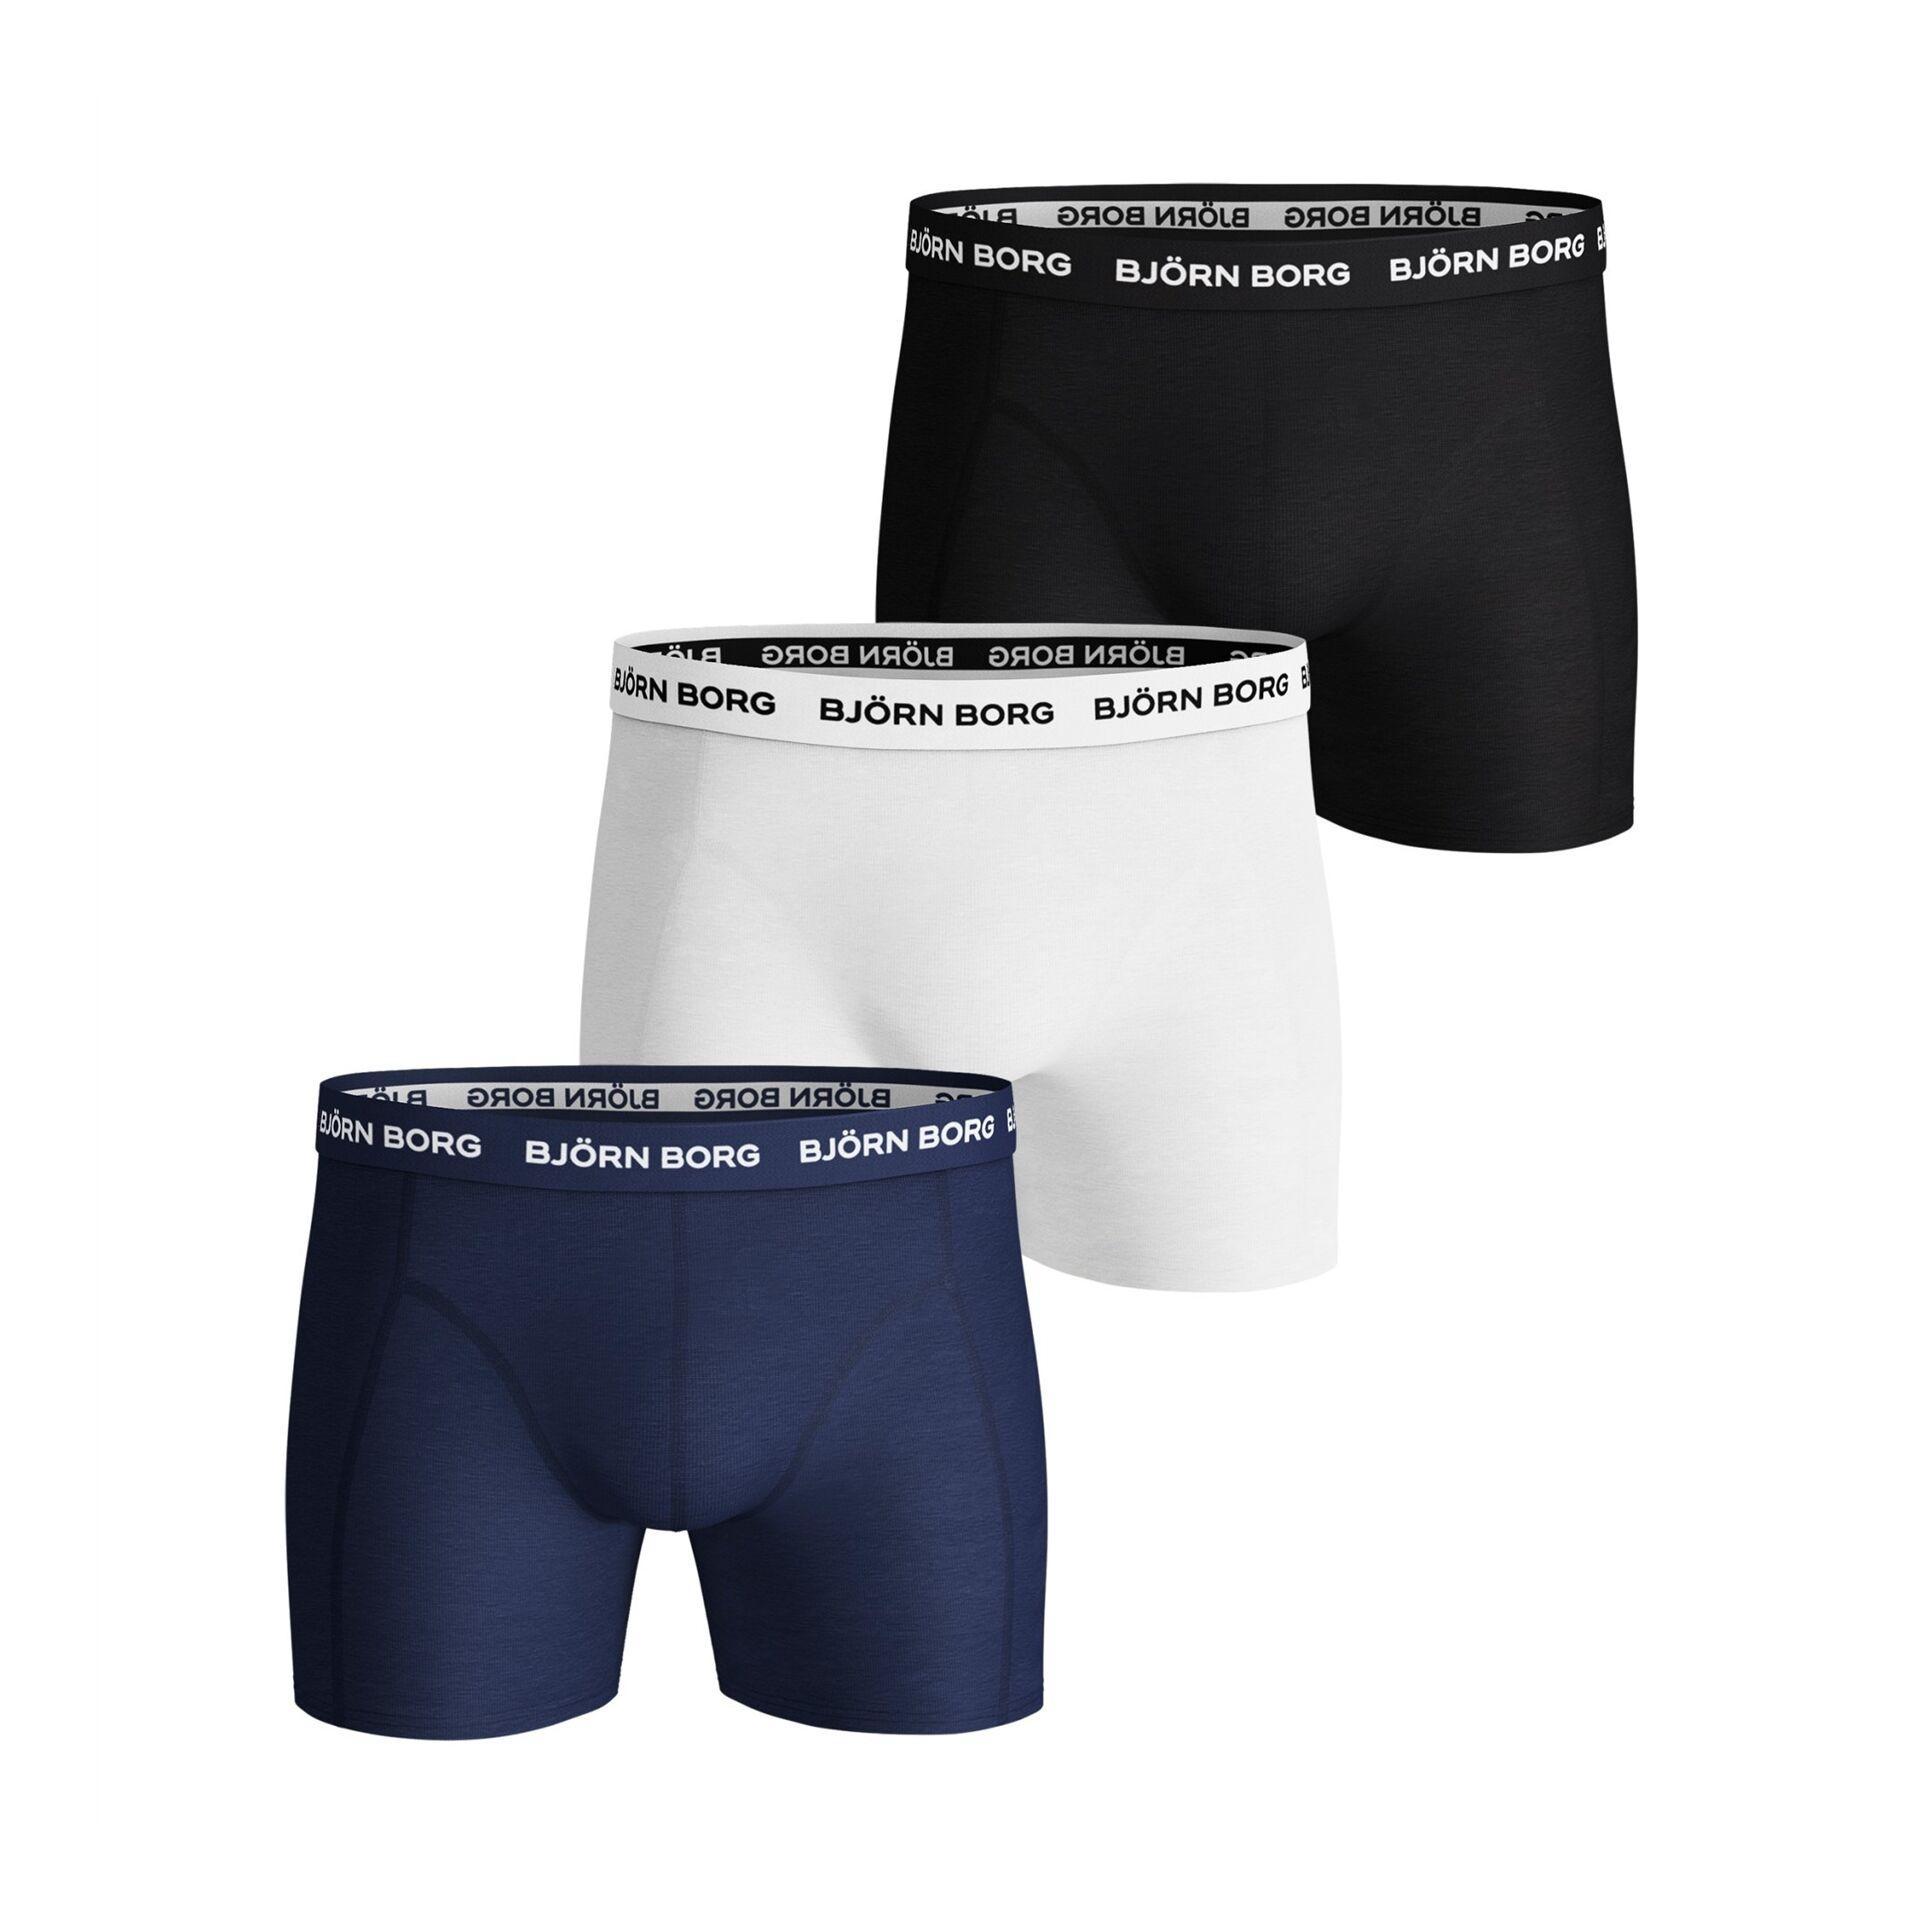 Björn Borg NOOS Solid Shorts Blue Depths 3-pack XL